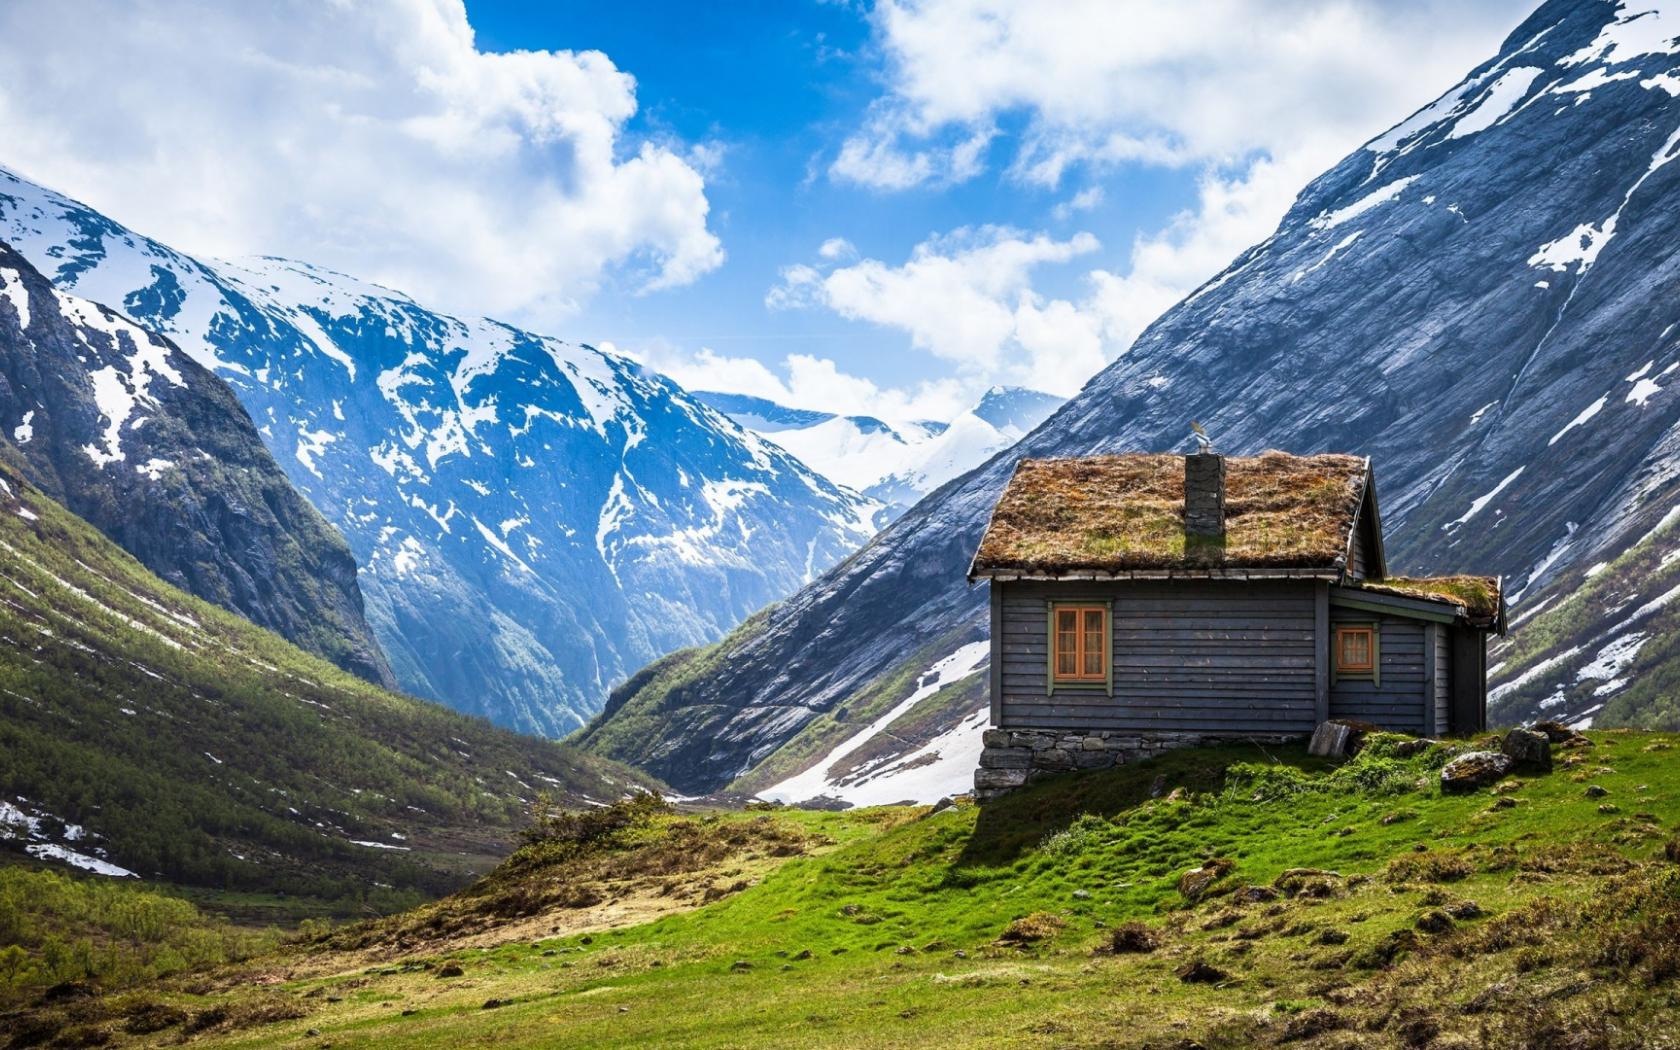 Free Download Wallpaper 1920x1080 Mountain Lodge Top Snow Full Hd